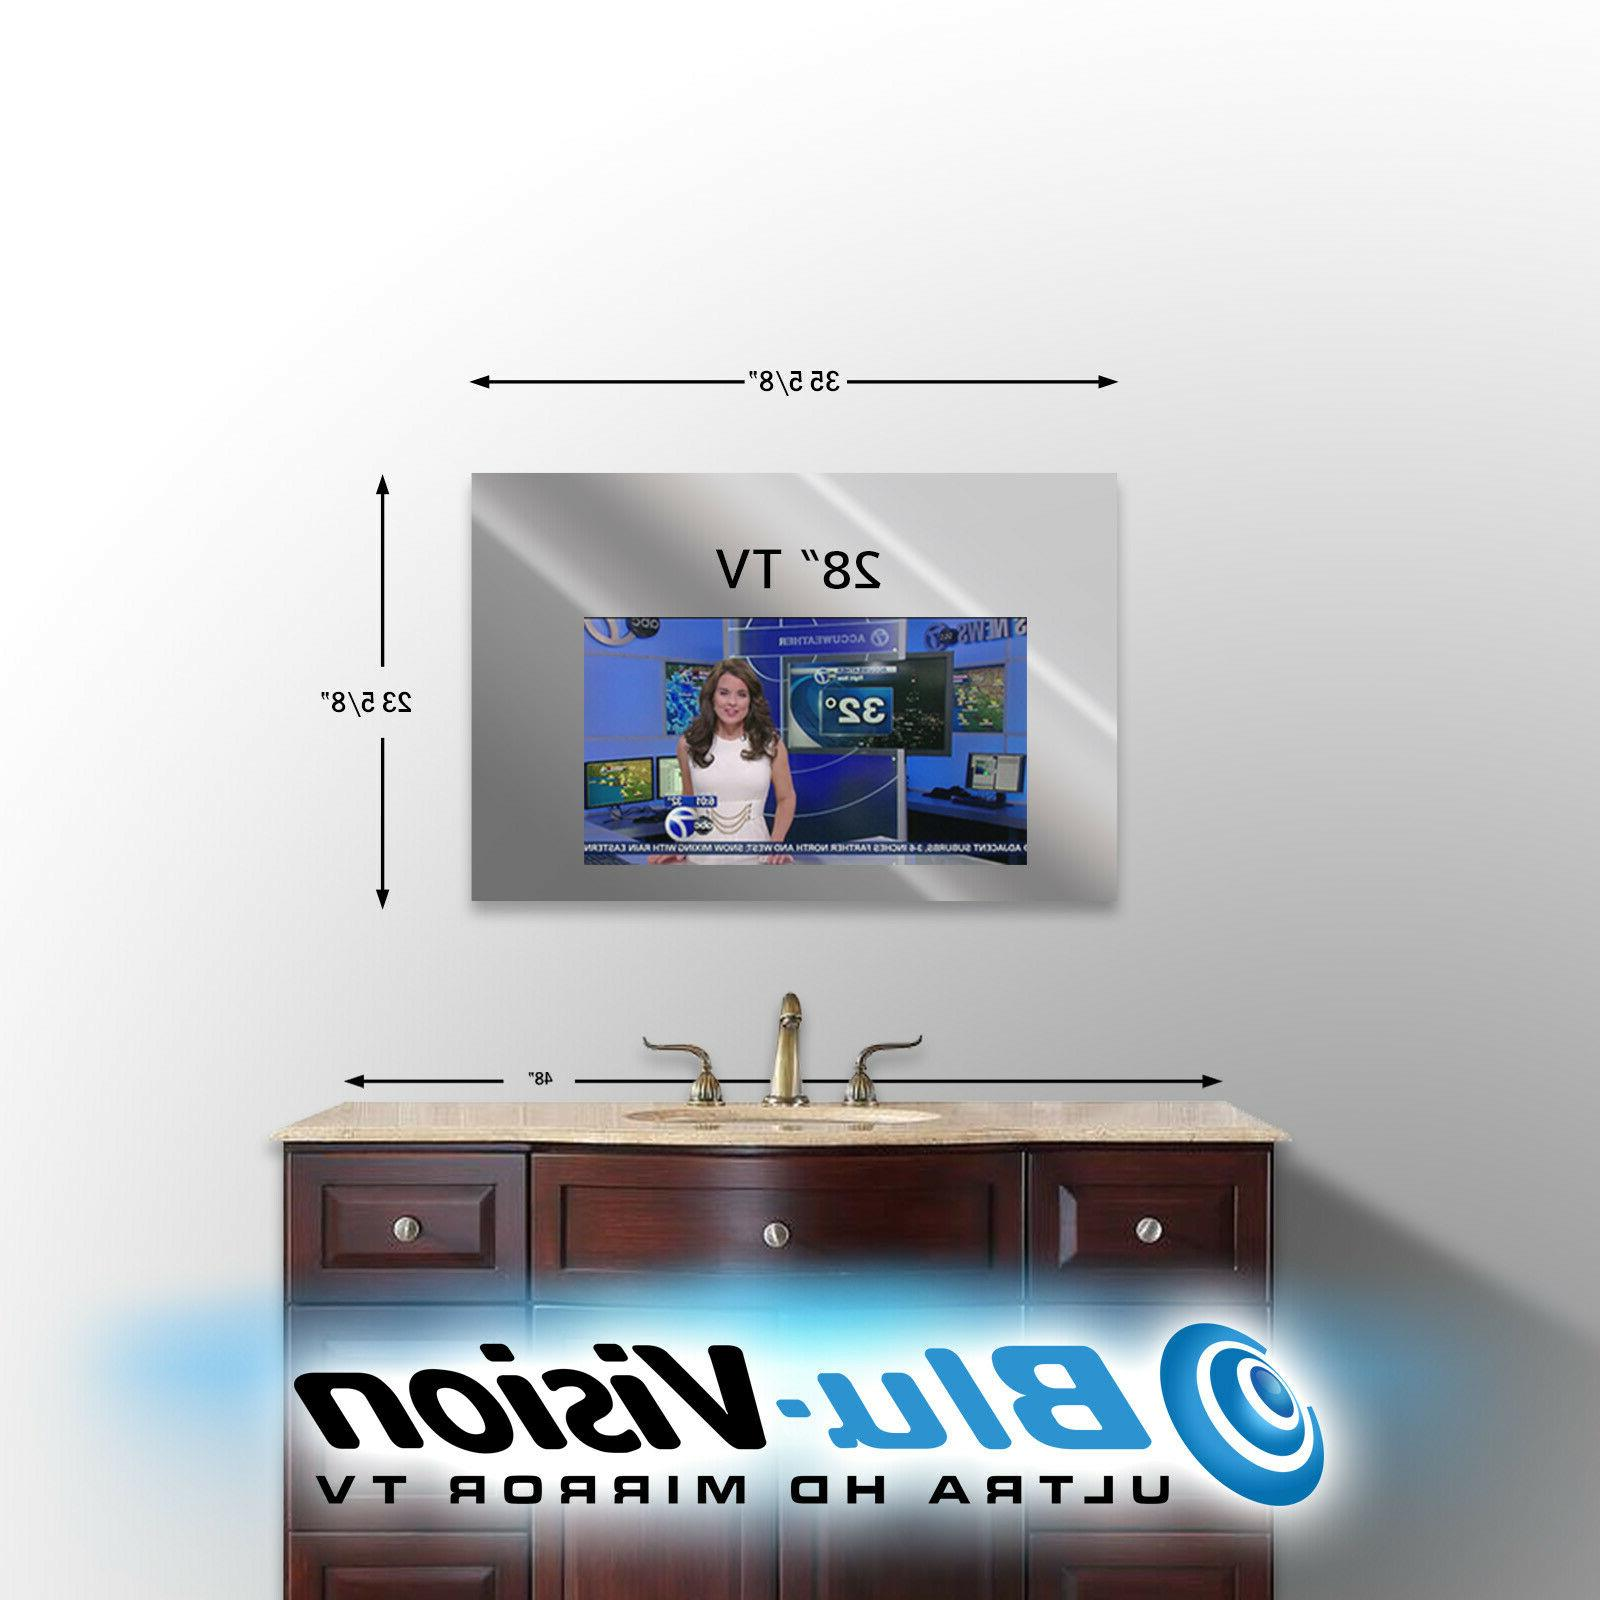 "VANITY MIRROR TV 28"" LG LED 720p TV 35 5/8"" WIDE X 23 5/"